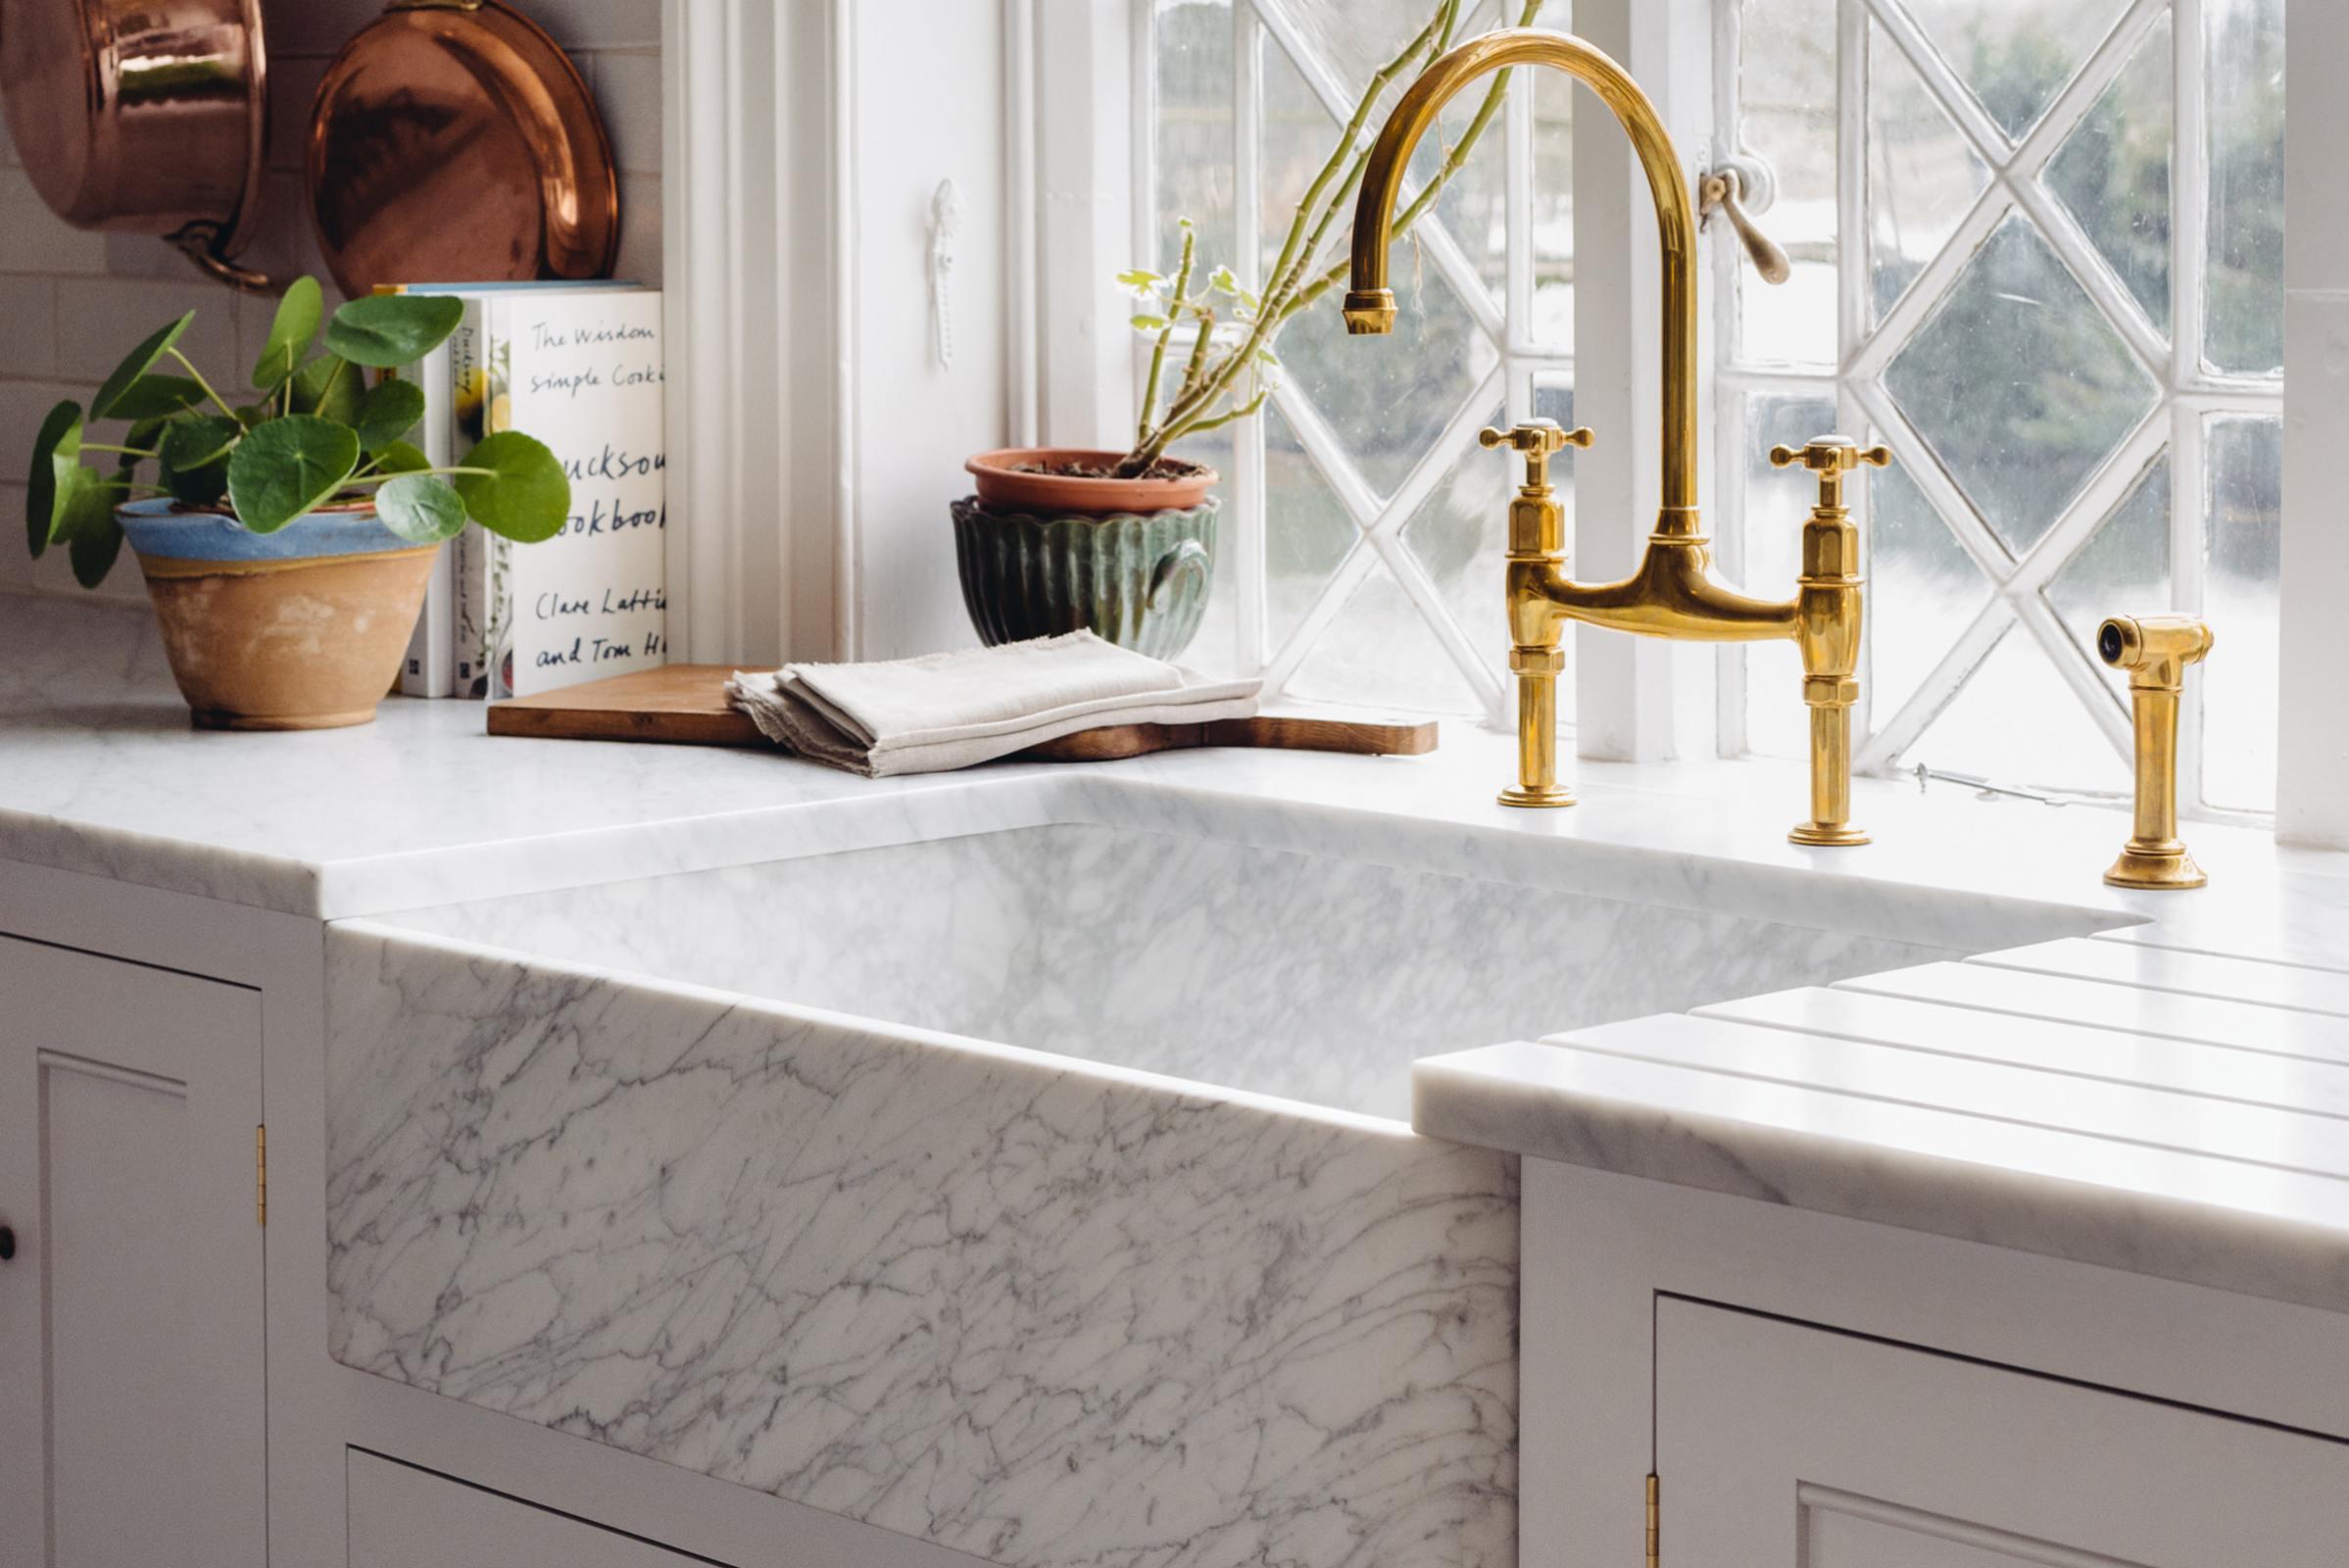 Milano Penthouse 800 Single Marble Sink photo 2